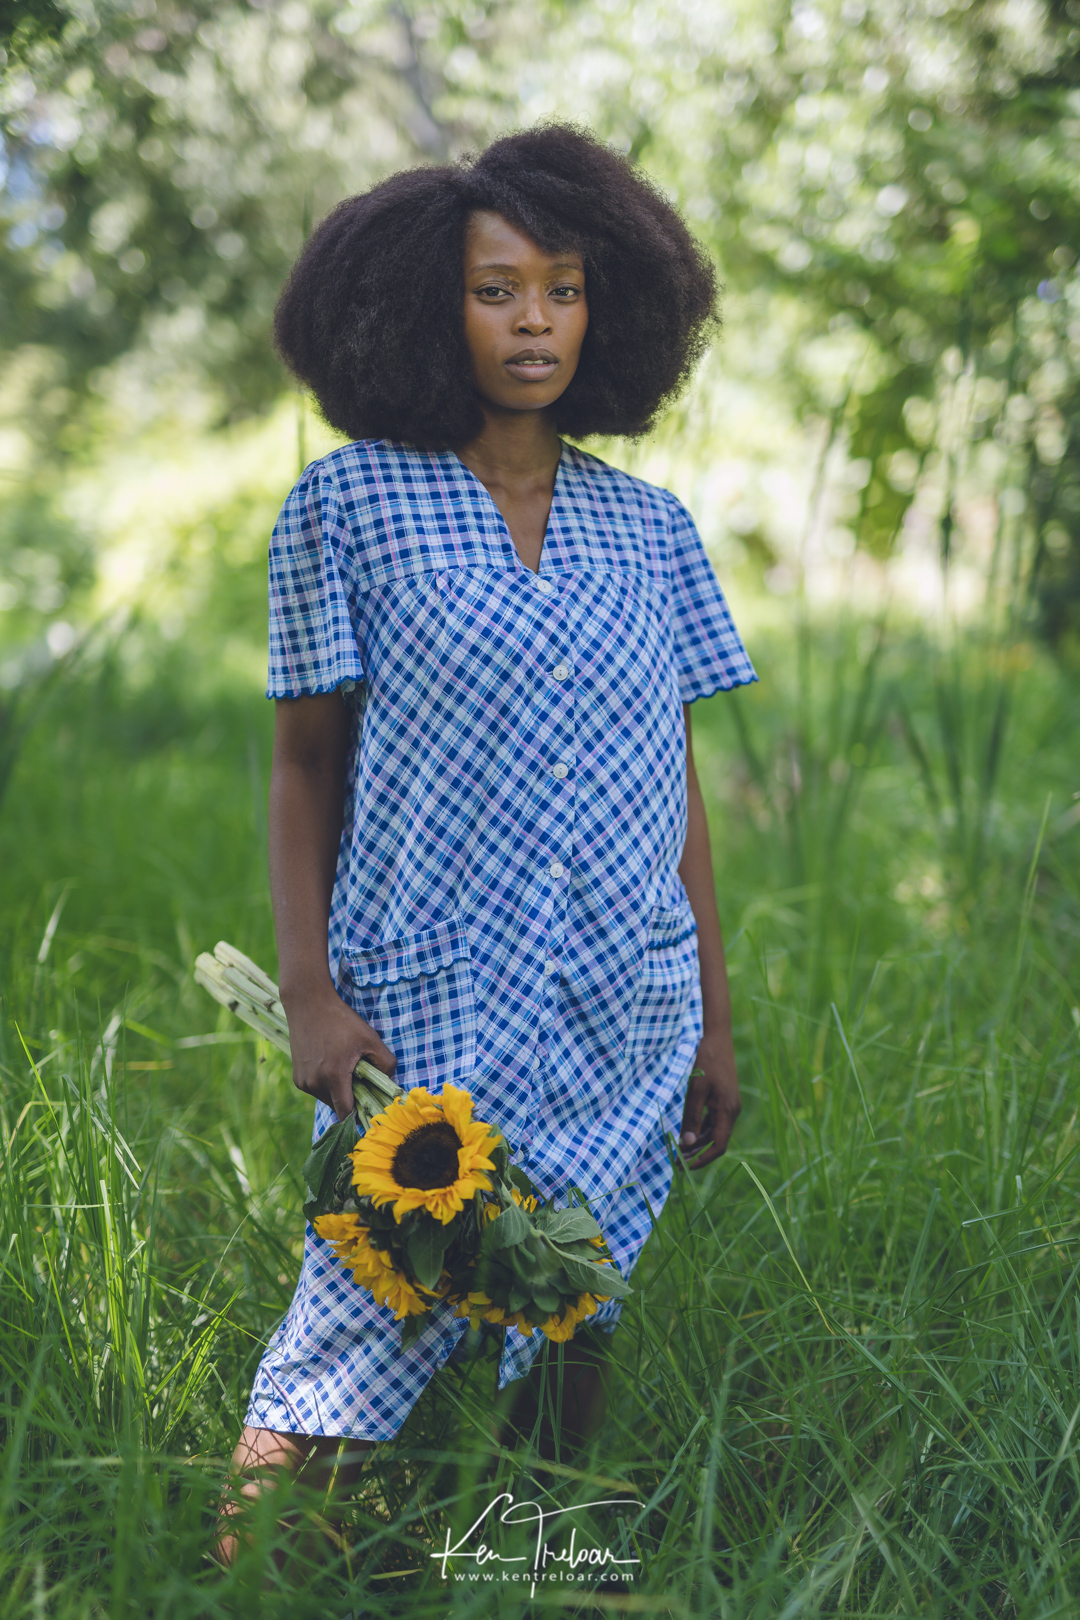 Ken Treloar Photography - Natural L-ight Editorial Portrait Fashion Photo Session - Cape Town Dec 2018-35.jpg